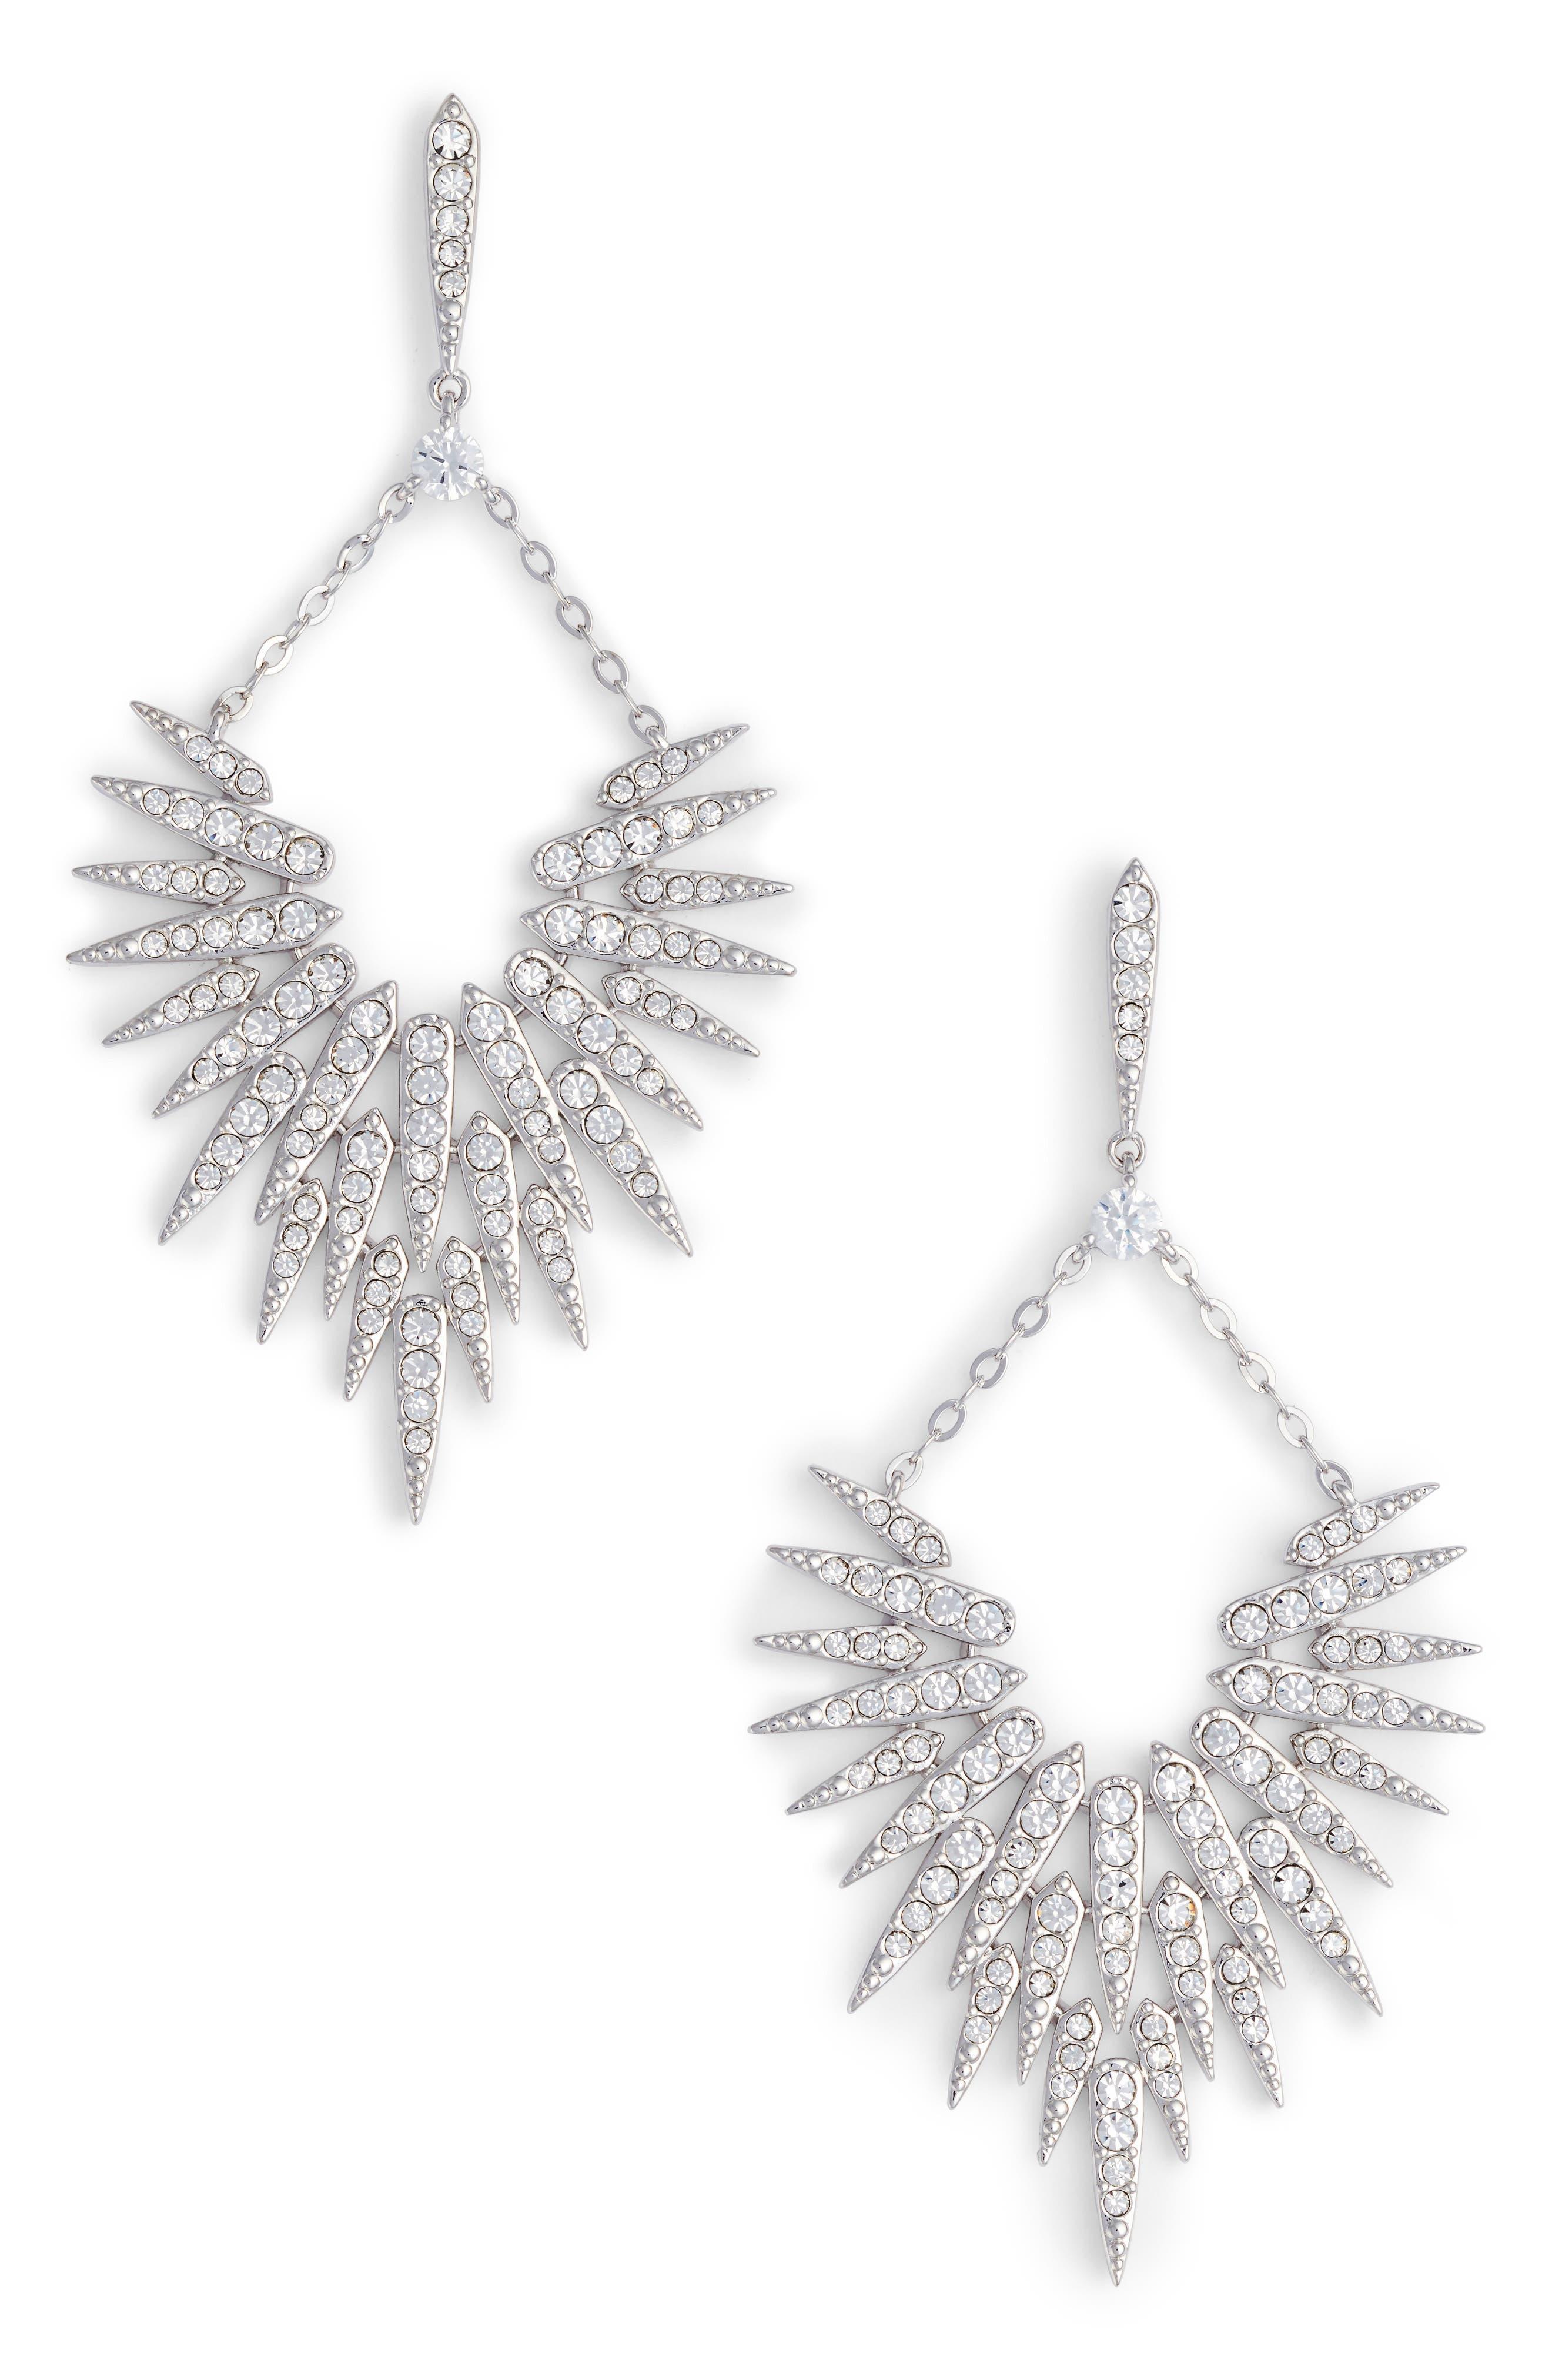 Cubic Zirconia Sunburst Drop Earrings,                             Main thumbnail 1, color,                             Silver